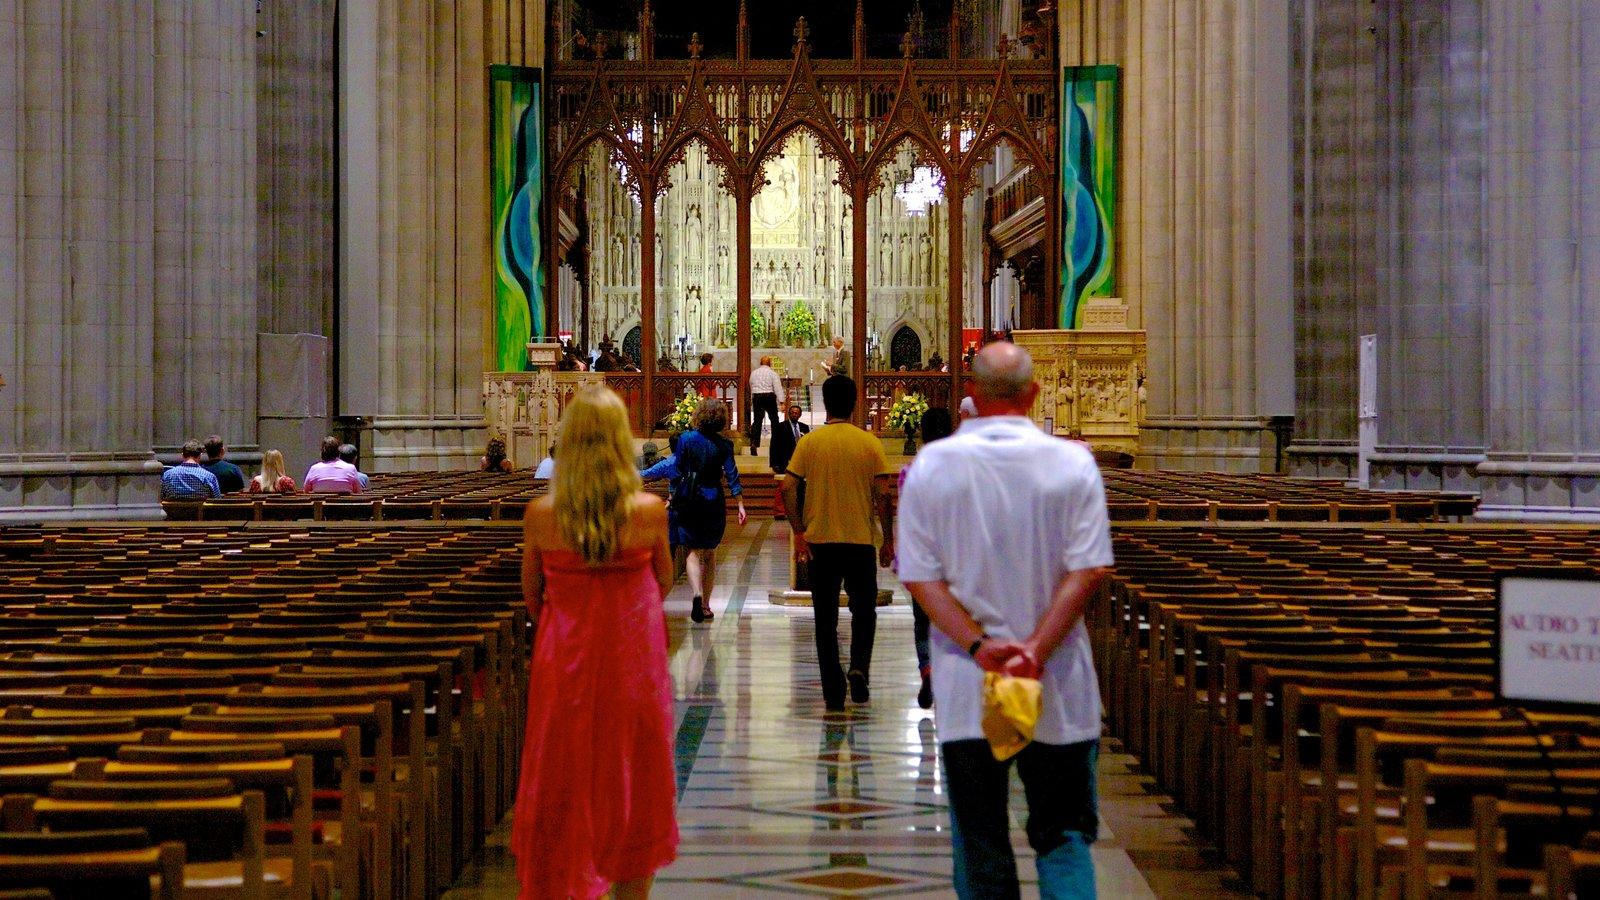 Catedral de Washington caracterizando vistas internas, uma igreja ou catedral e aspectos religiosos